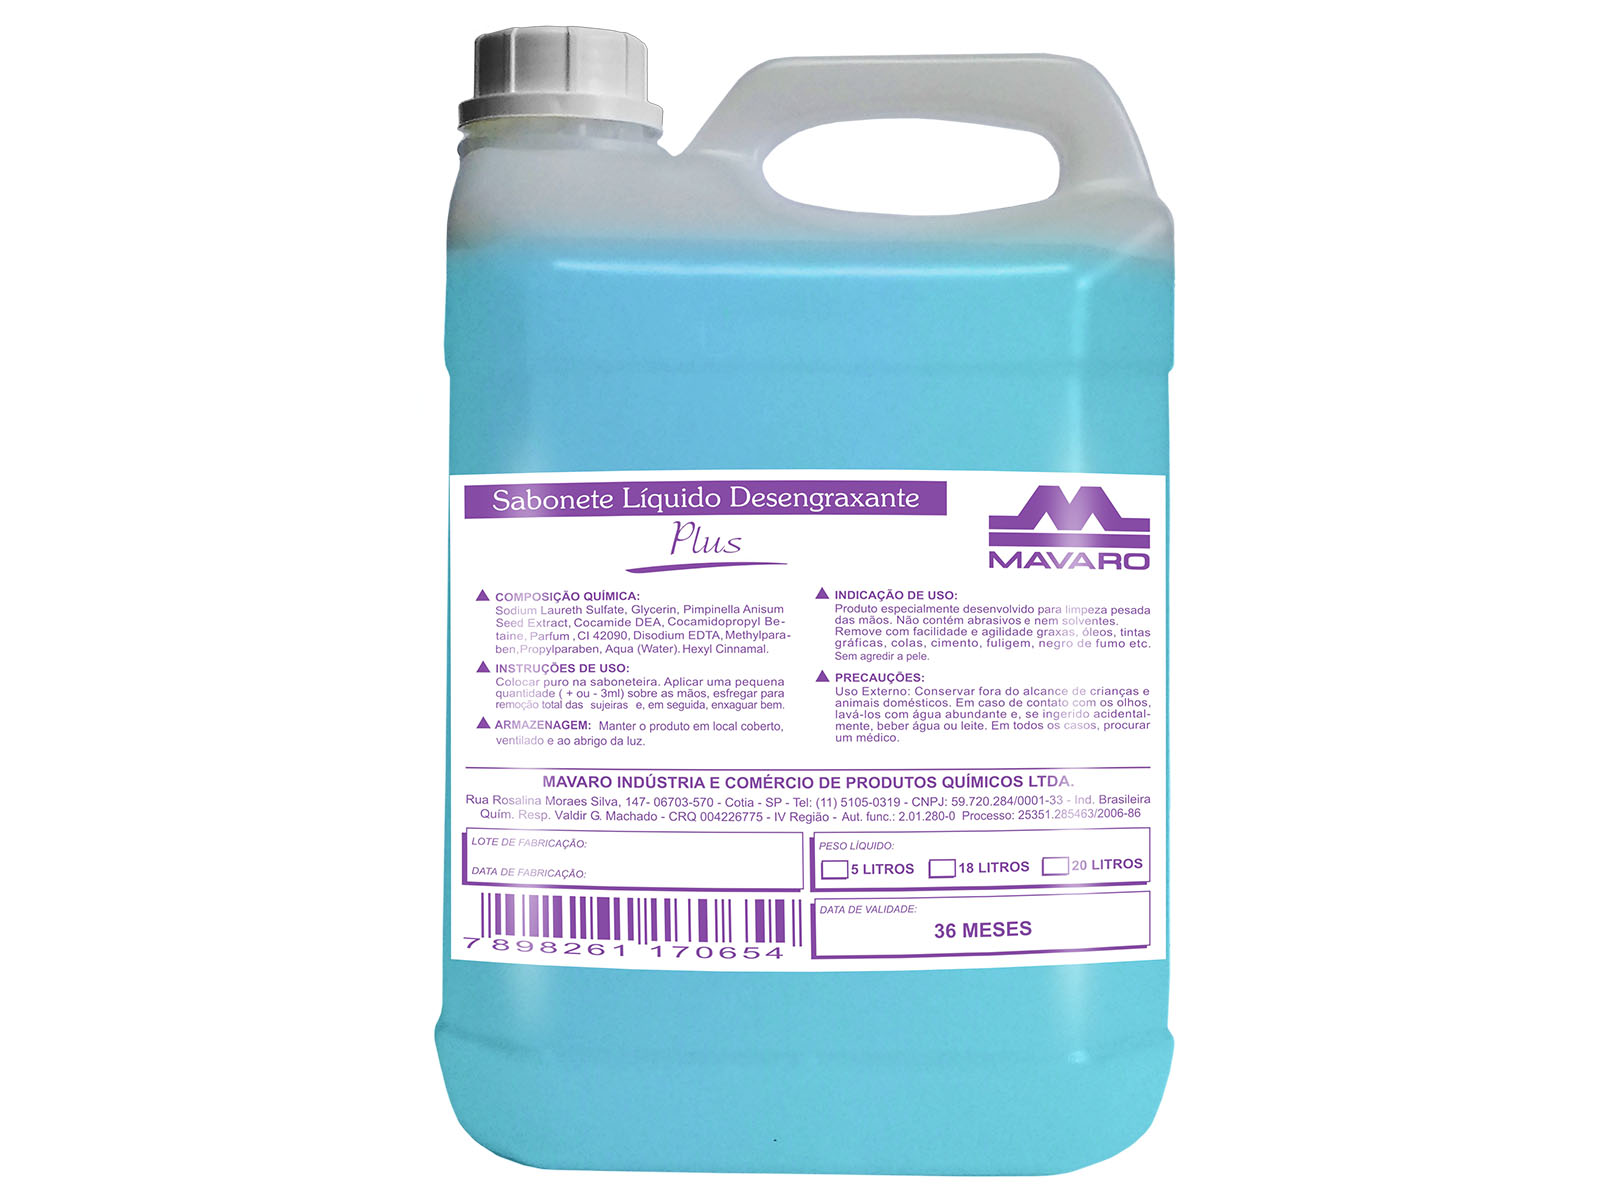 Sabonete líquido desengraxante plus.